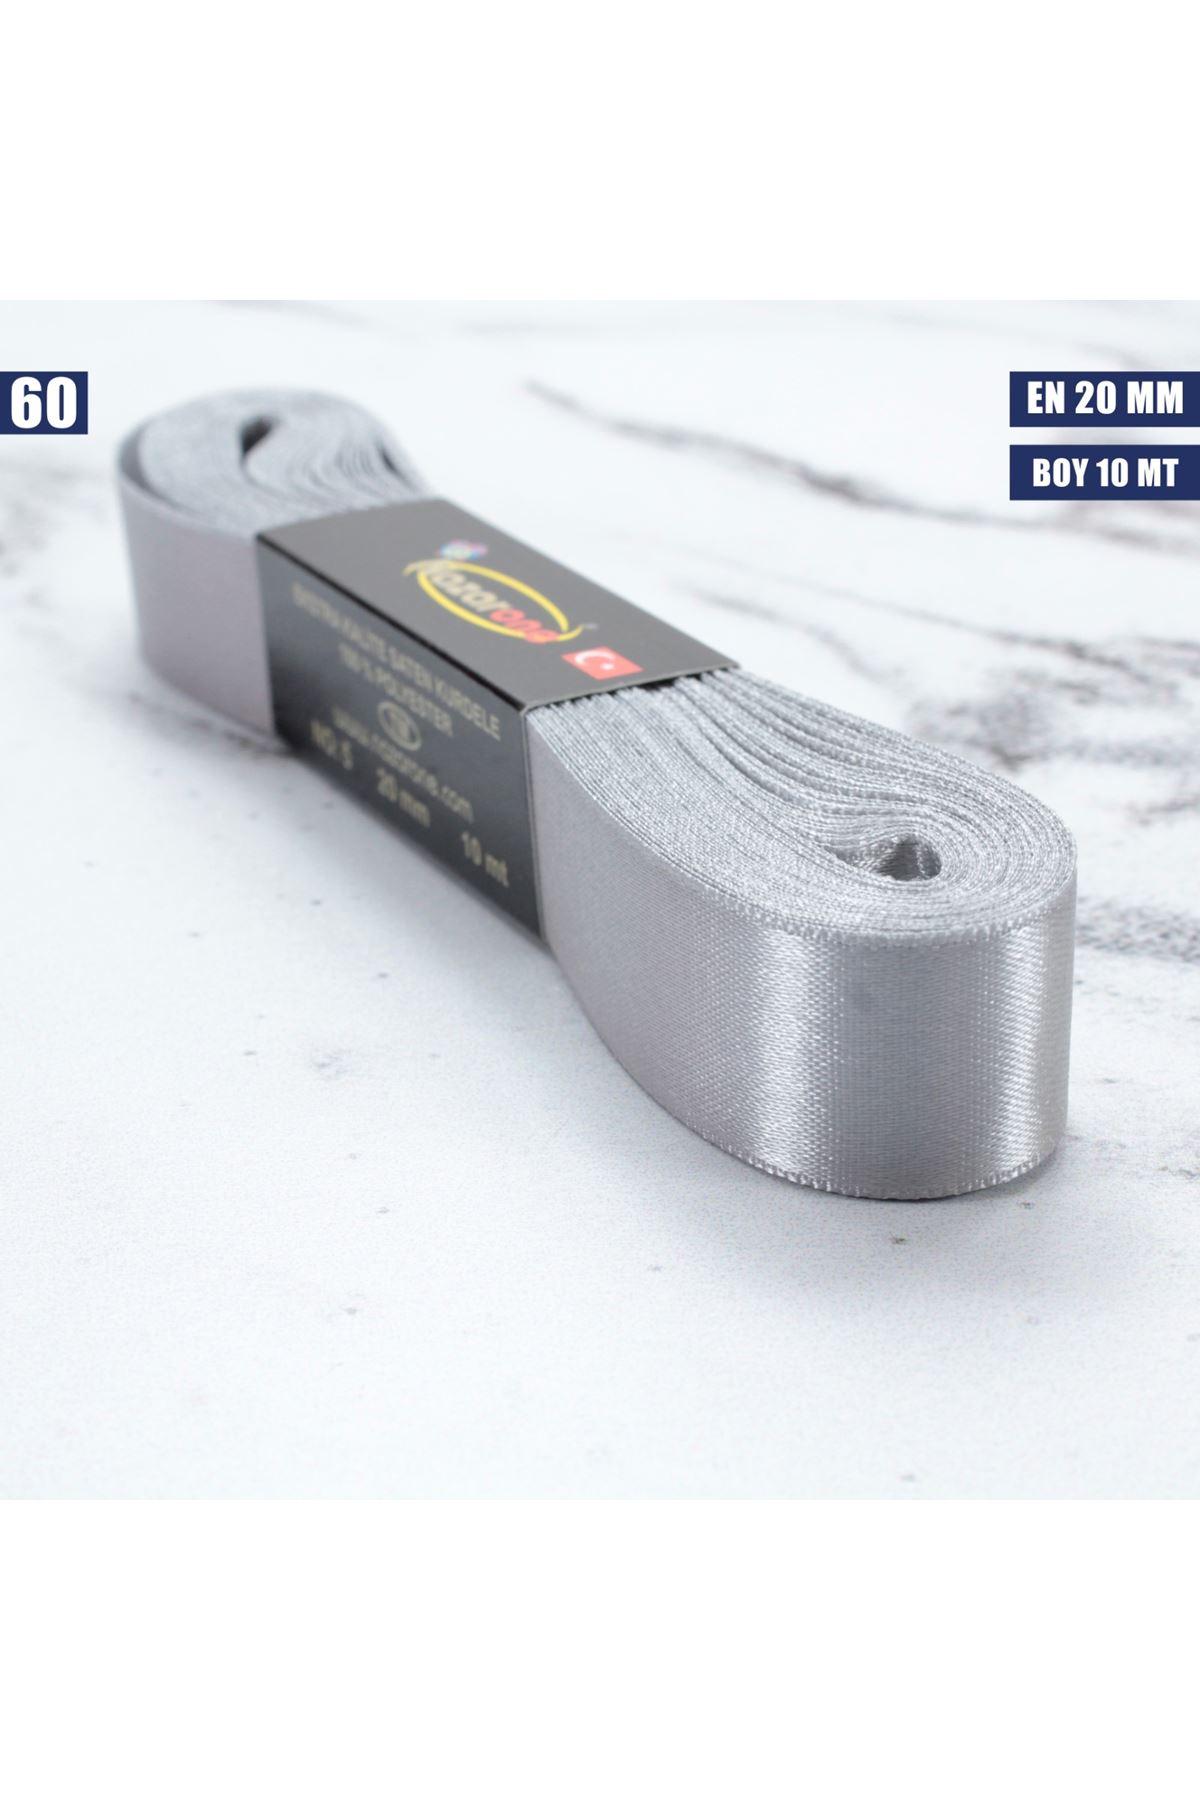 Saten Kurdele - 20 mm - 60